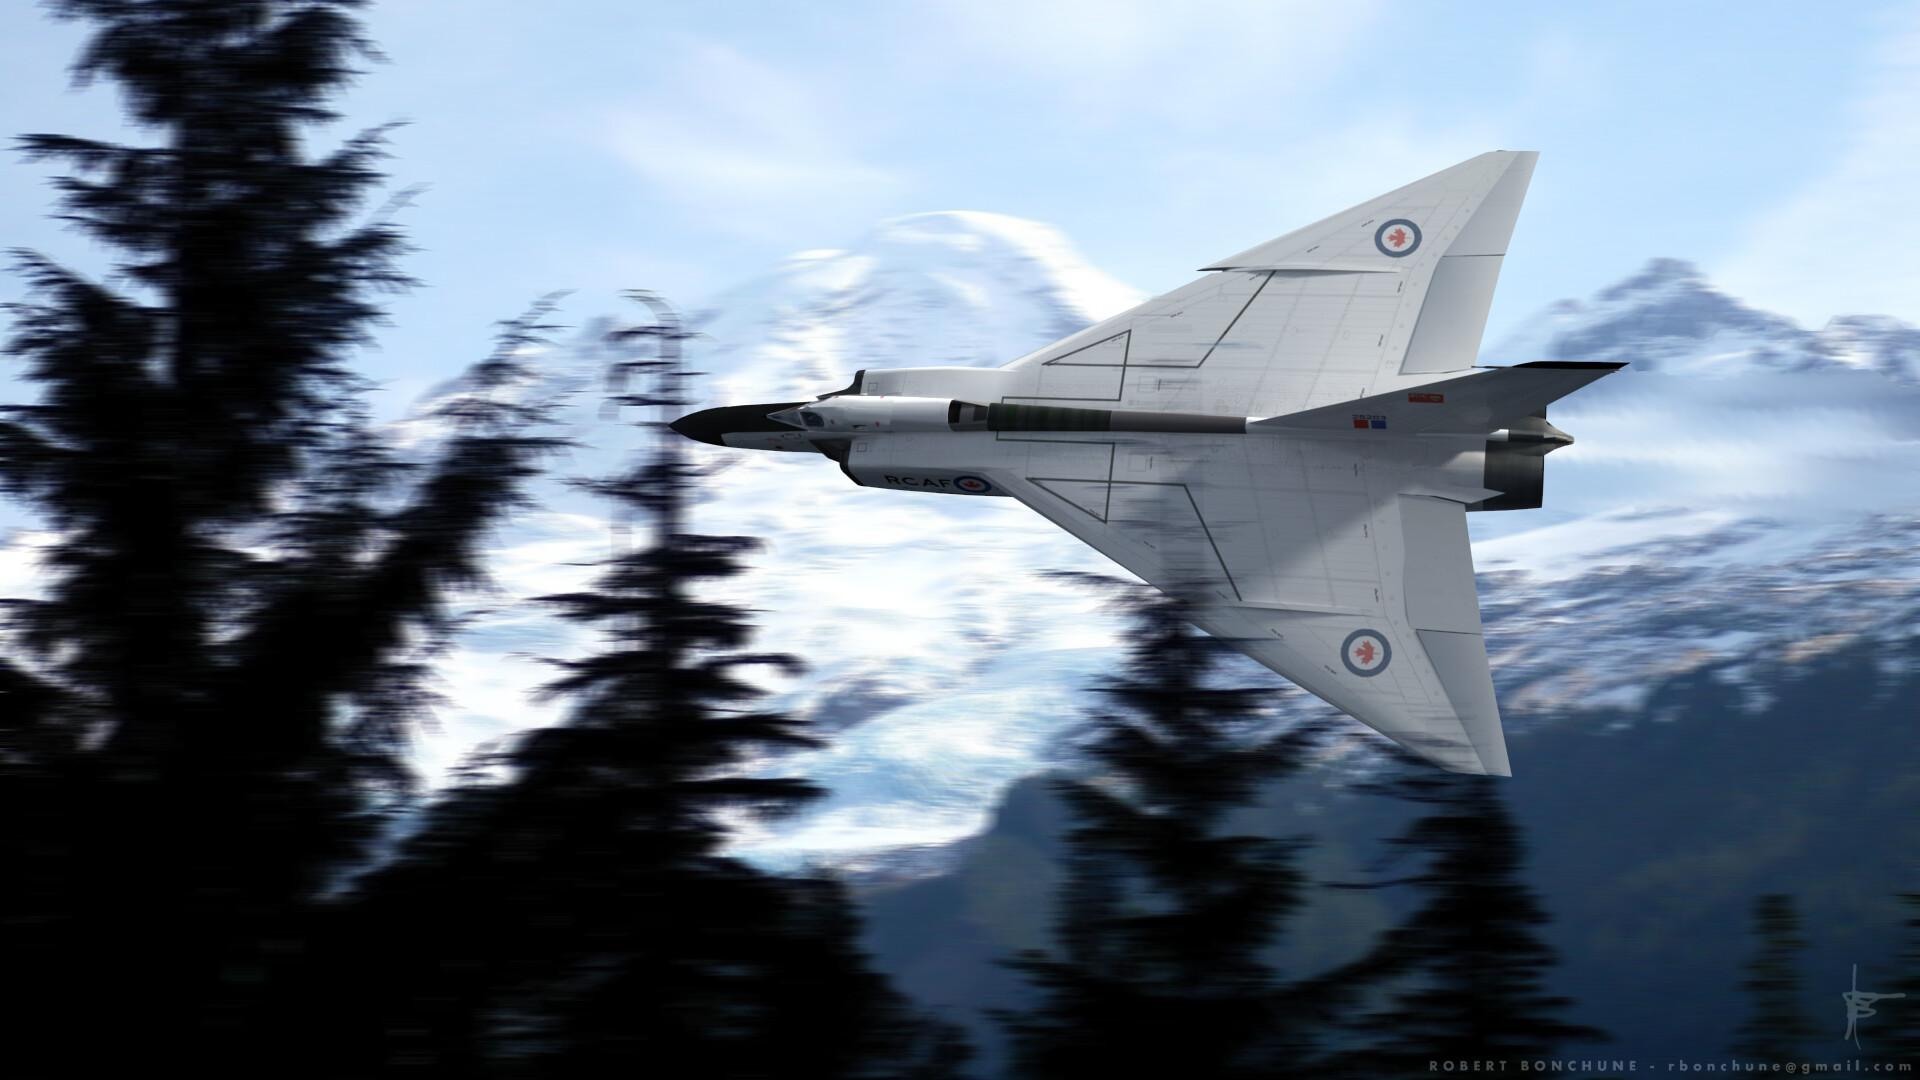 Robert Bonchune - Avro CF-105 Arrow